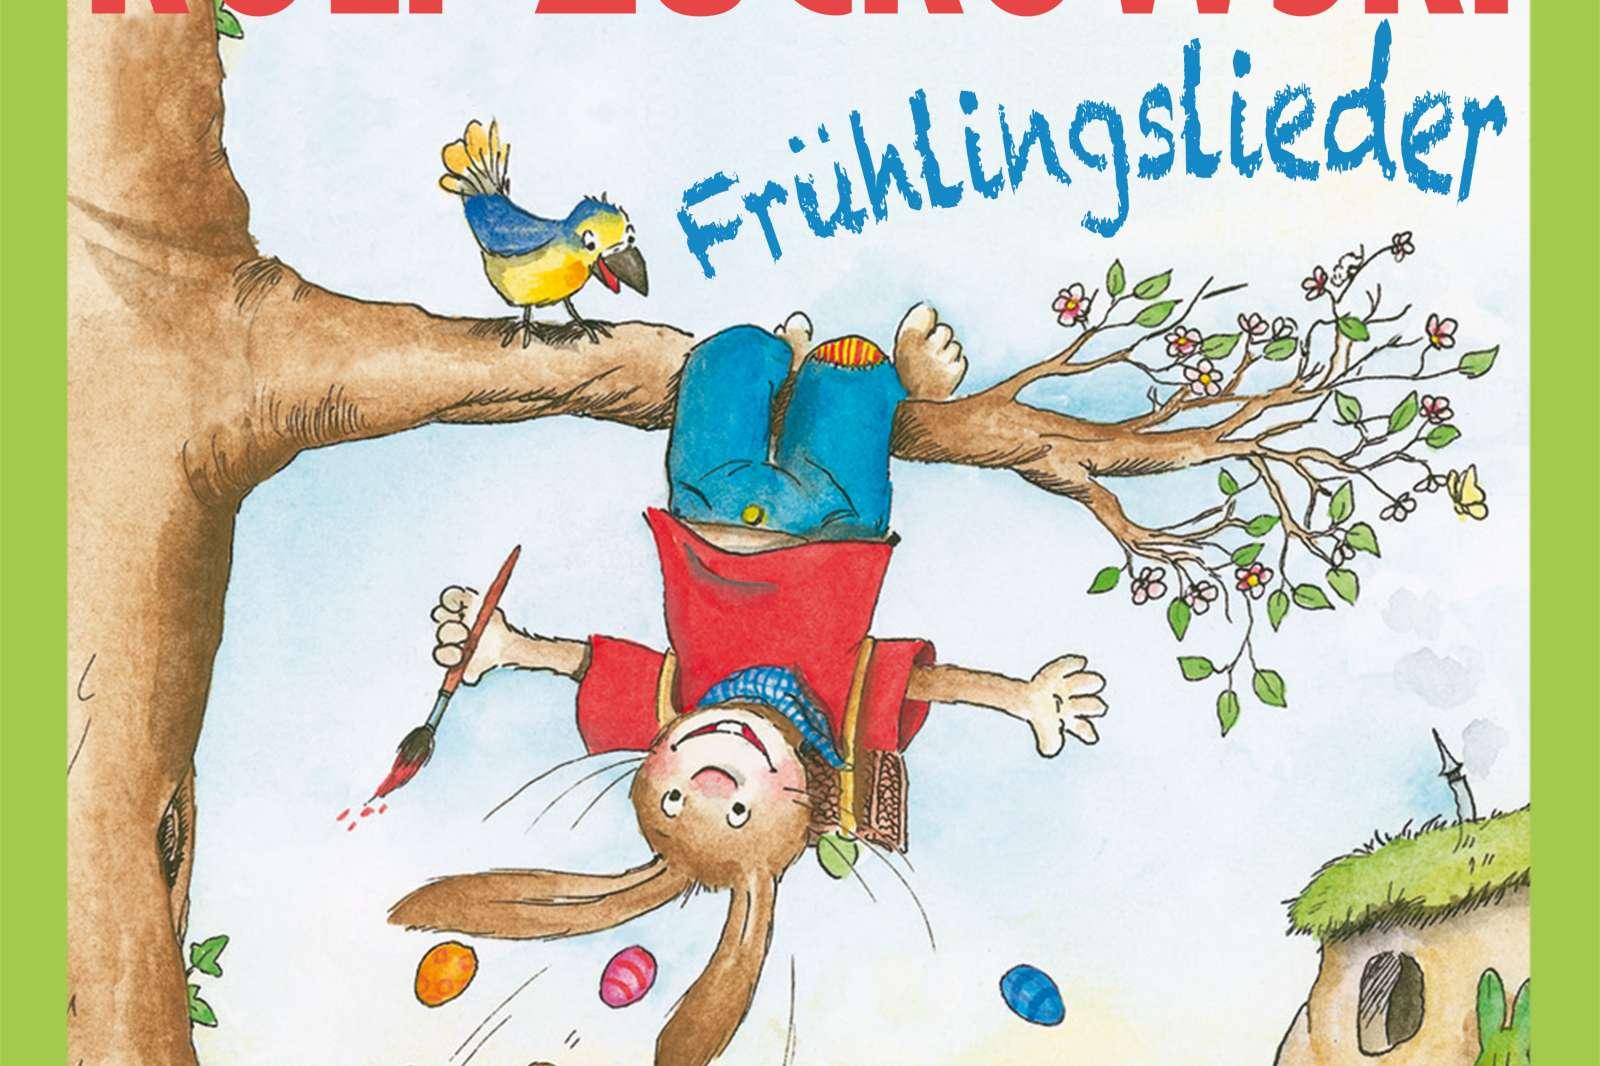 Frühlingslieder   Musik Für Dich   Rolf Zuckowski für Frühlingslieder Rolf Zuckowski